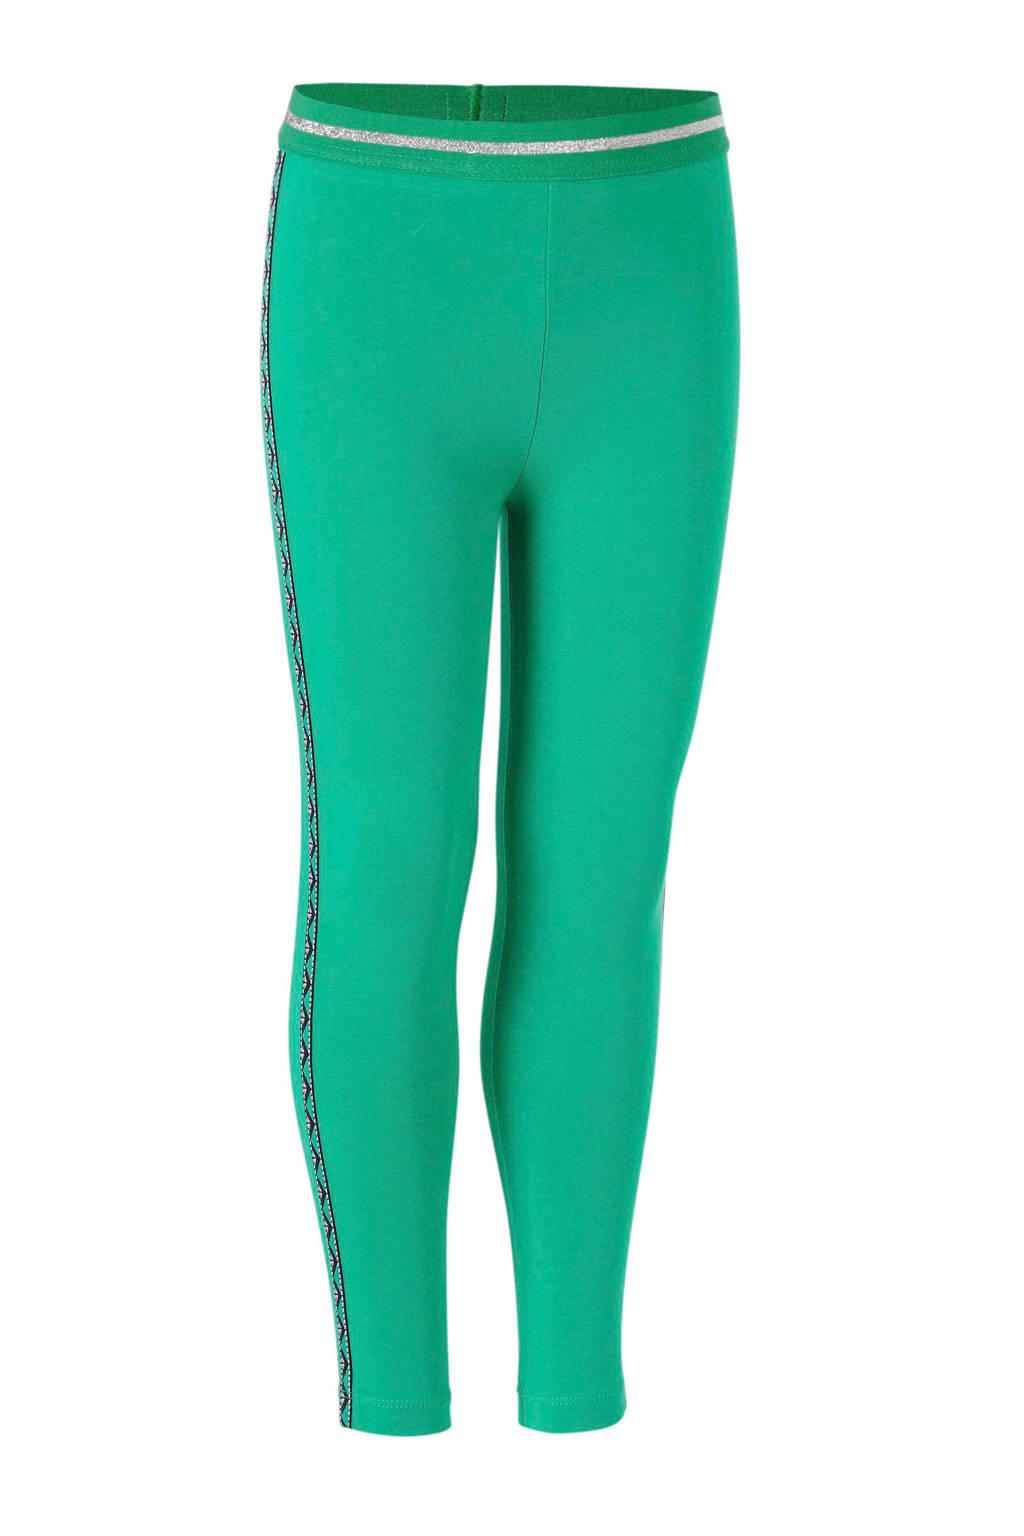 Quapi legging Shelley groen, Groen